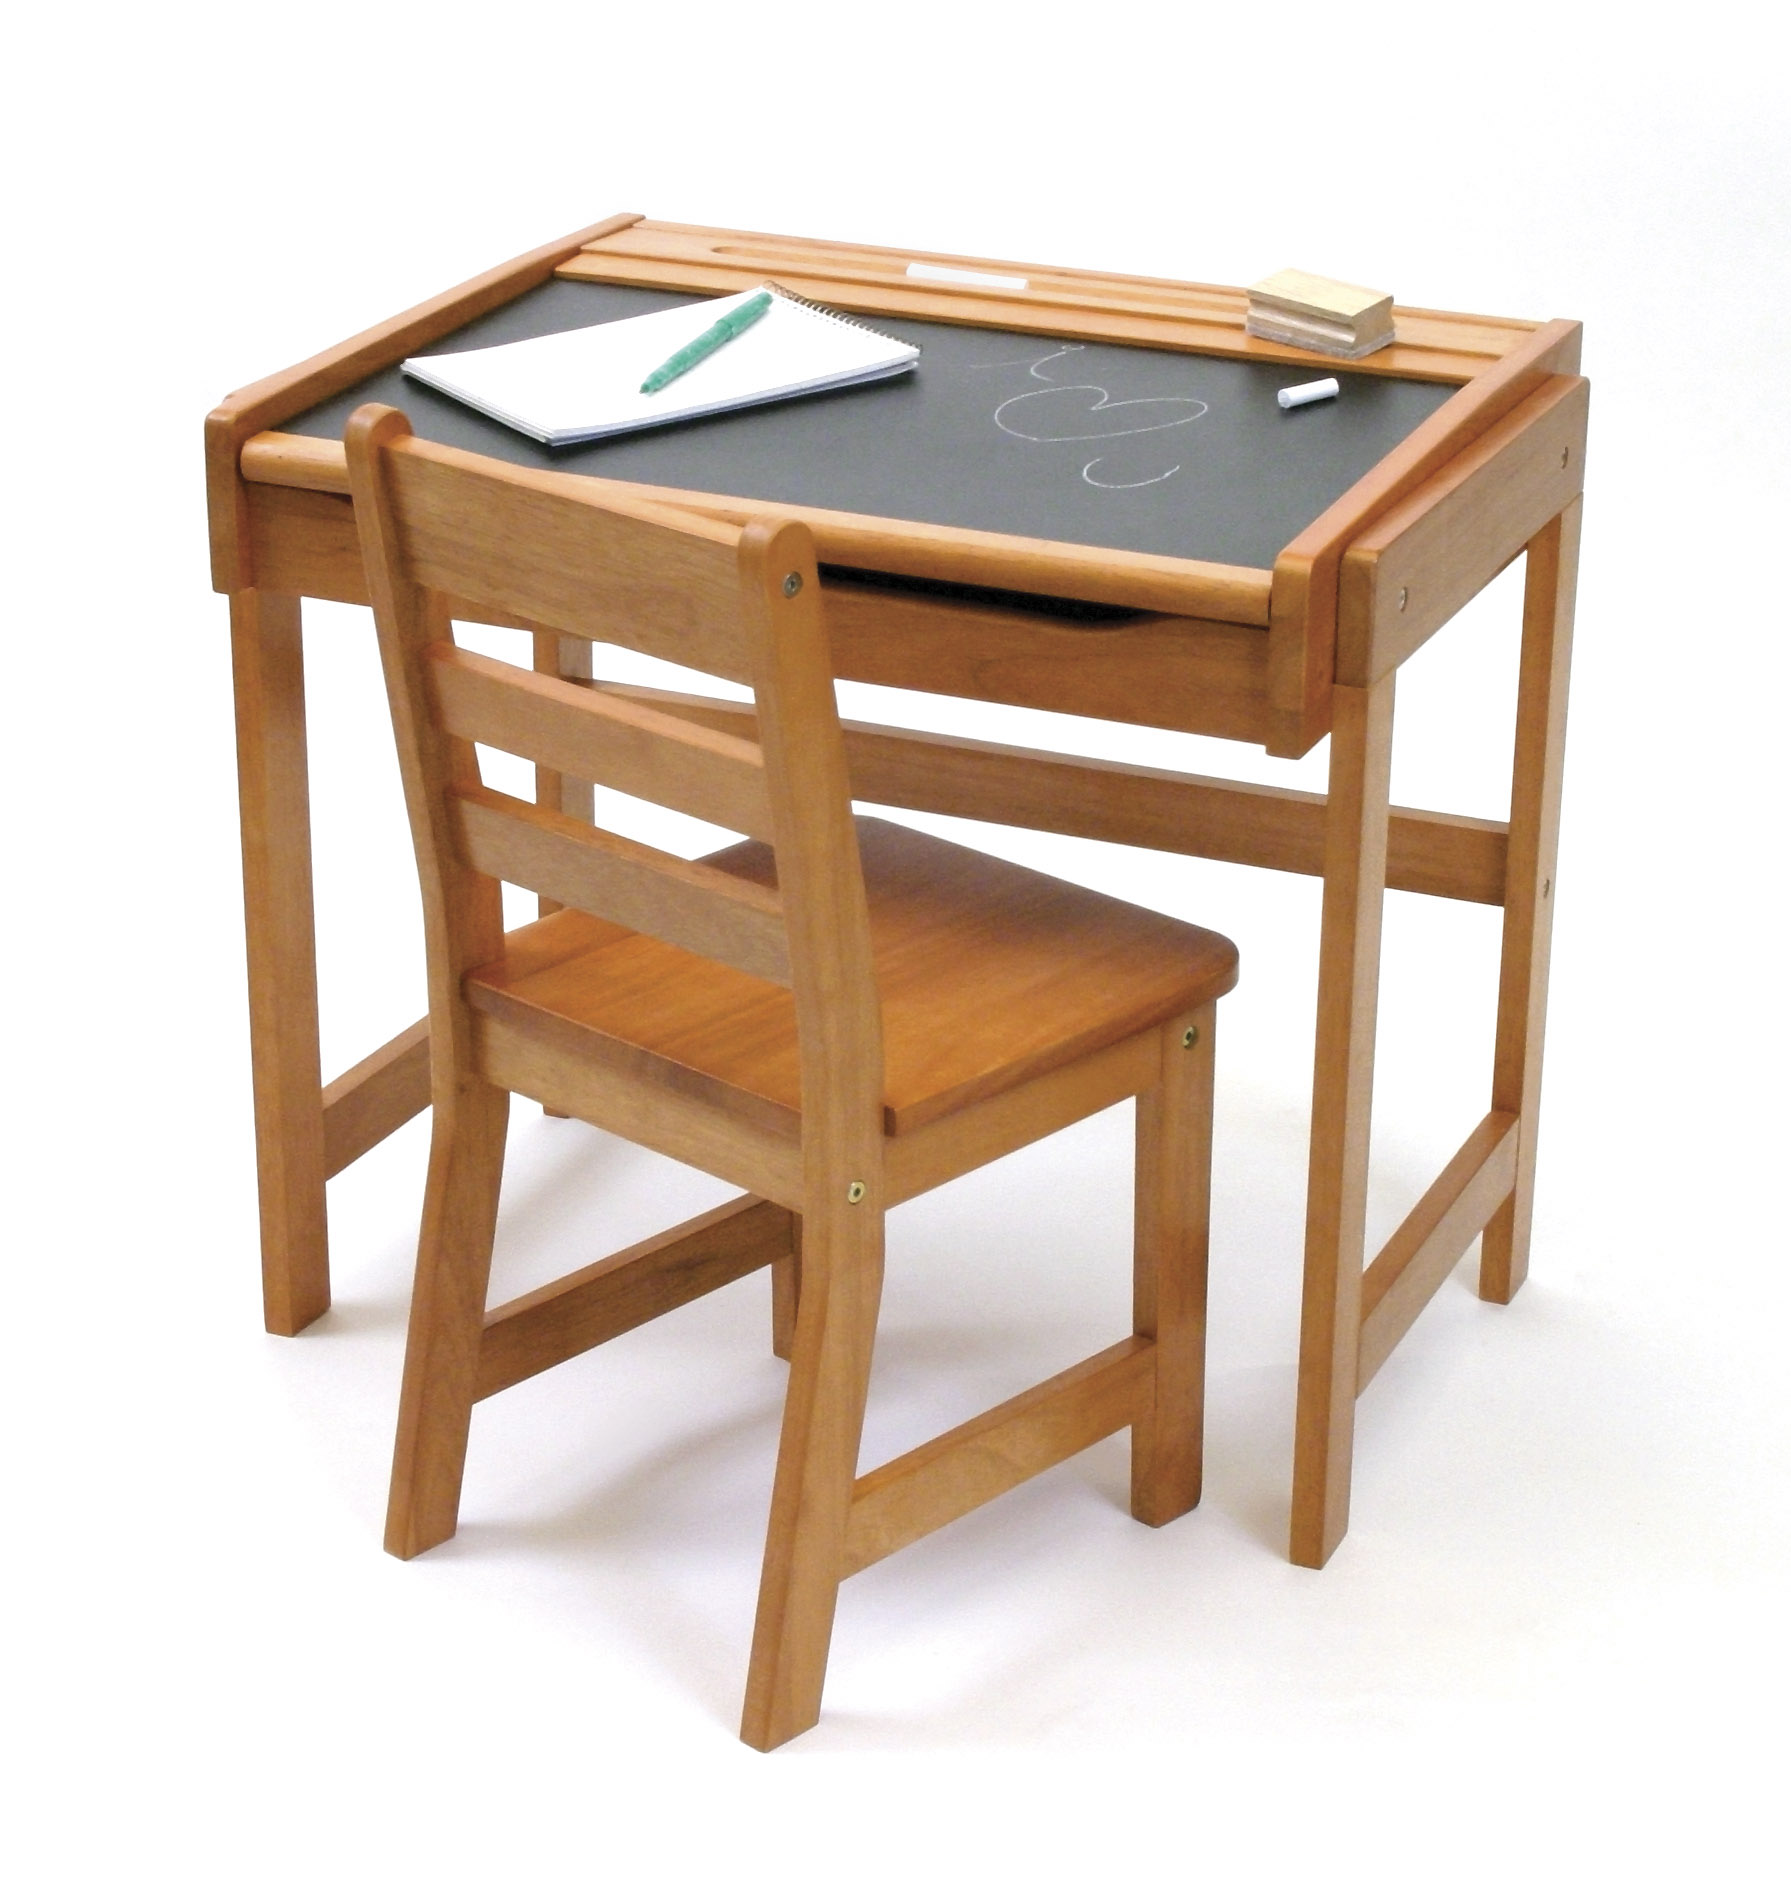 Child S Chalkboard Desk Chair 2 Piece Set Pecan Finish Lipper International Sets